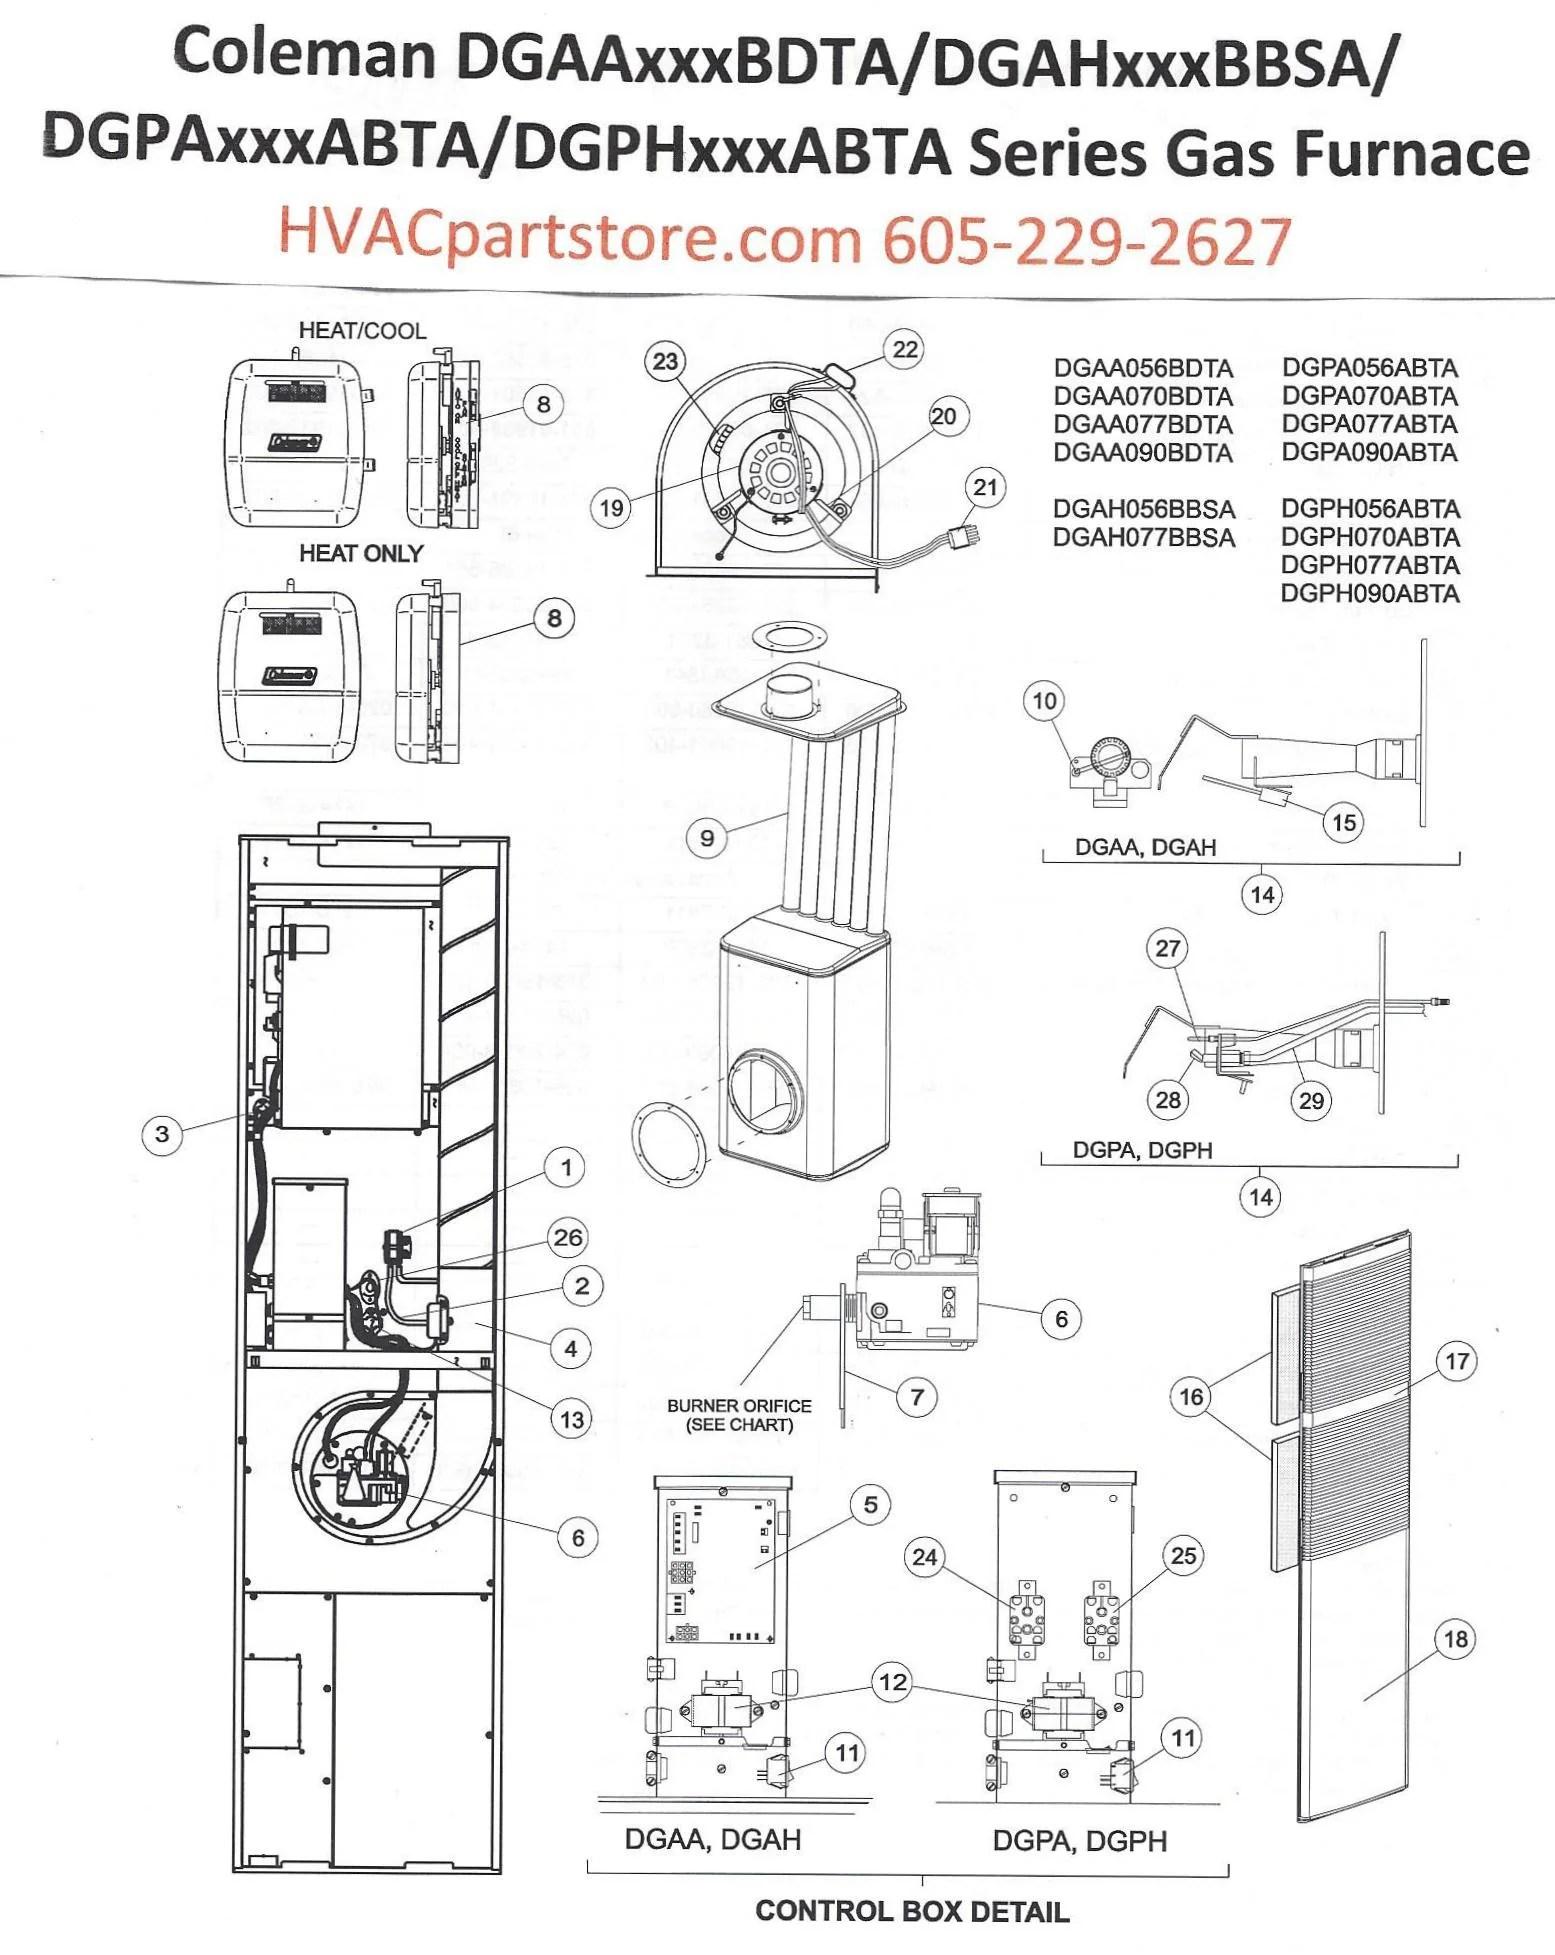 medium resolution of dgph070abta coleman gas furnace parts